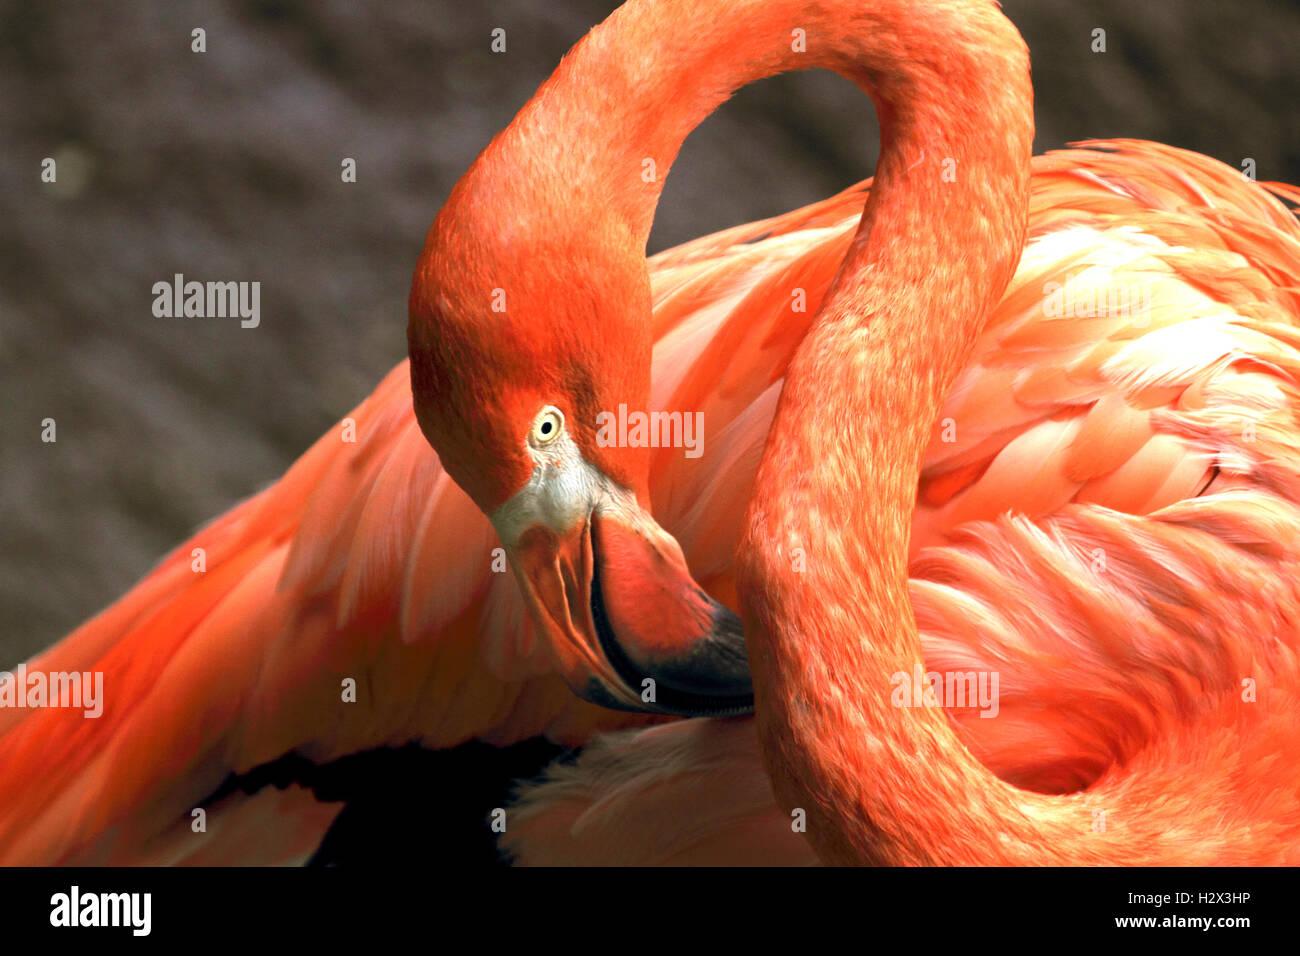 American Flamingo, Phoenicopterus ruber, Cape May County Zoo, New Jersey, USA Stock Photo